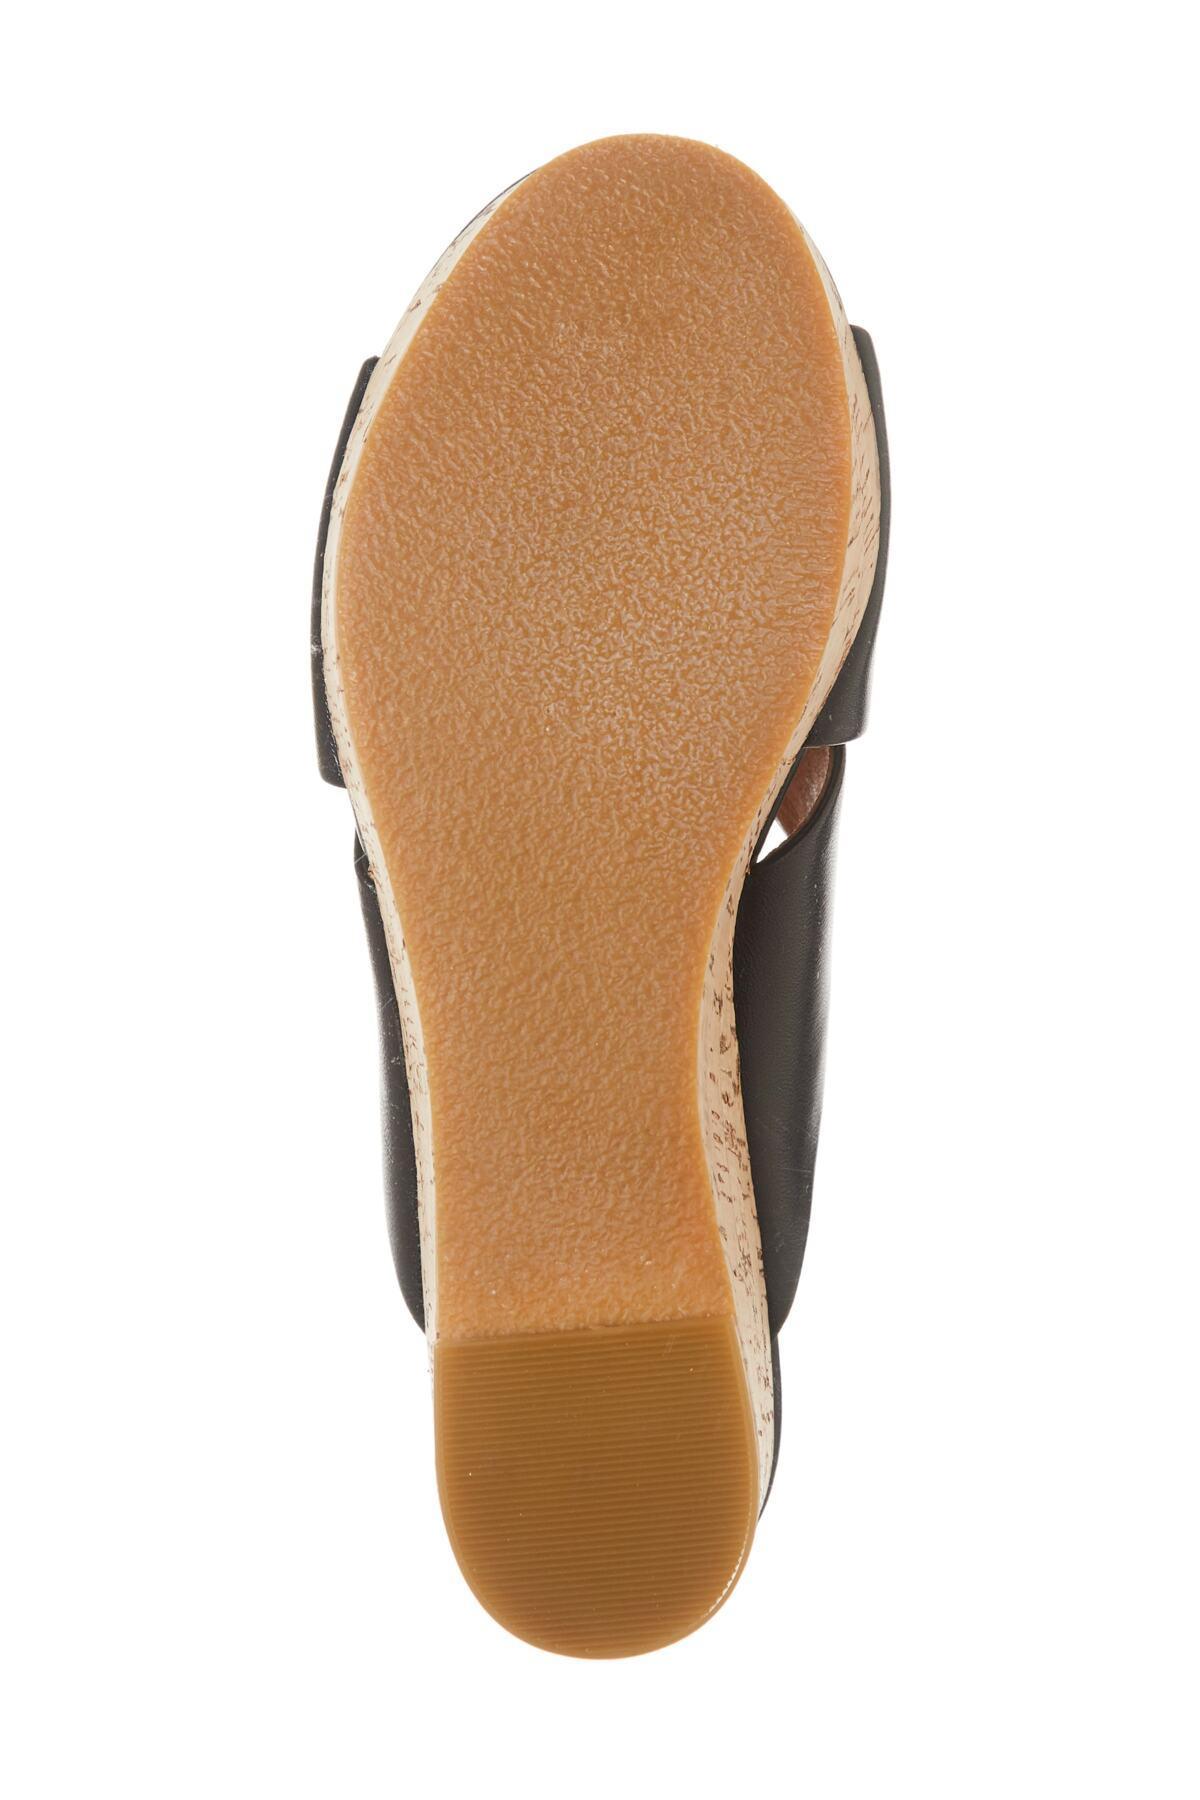 87c8f54edbc Halogen - Black (r) Elena Platform Wedge Sandal (women) - Lyst. View  fullscreen